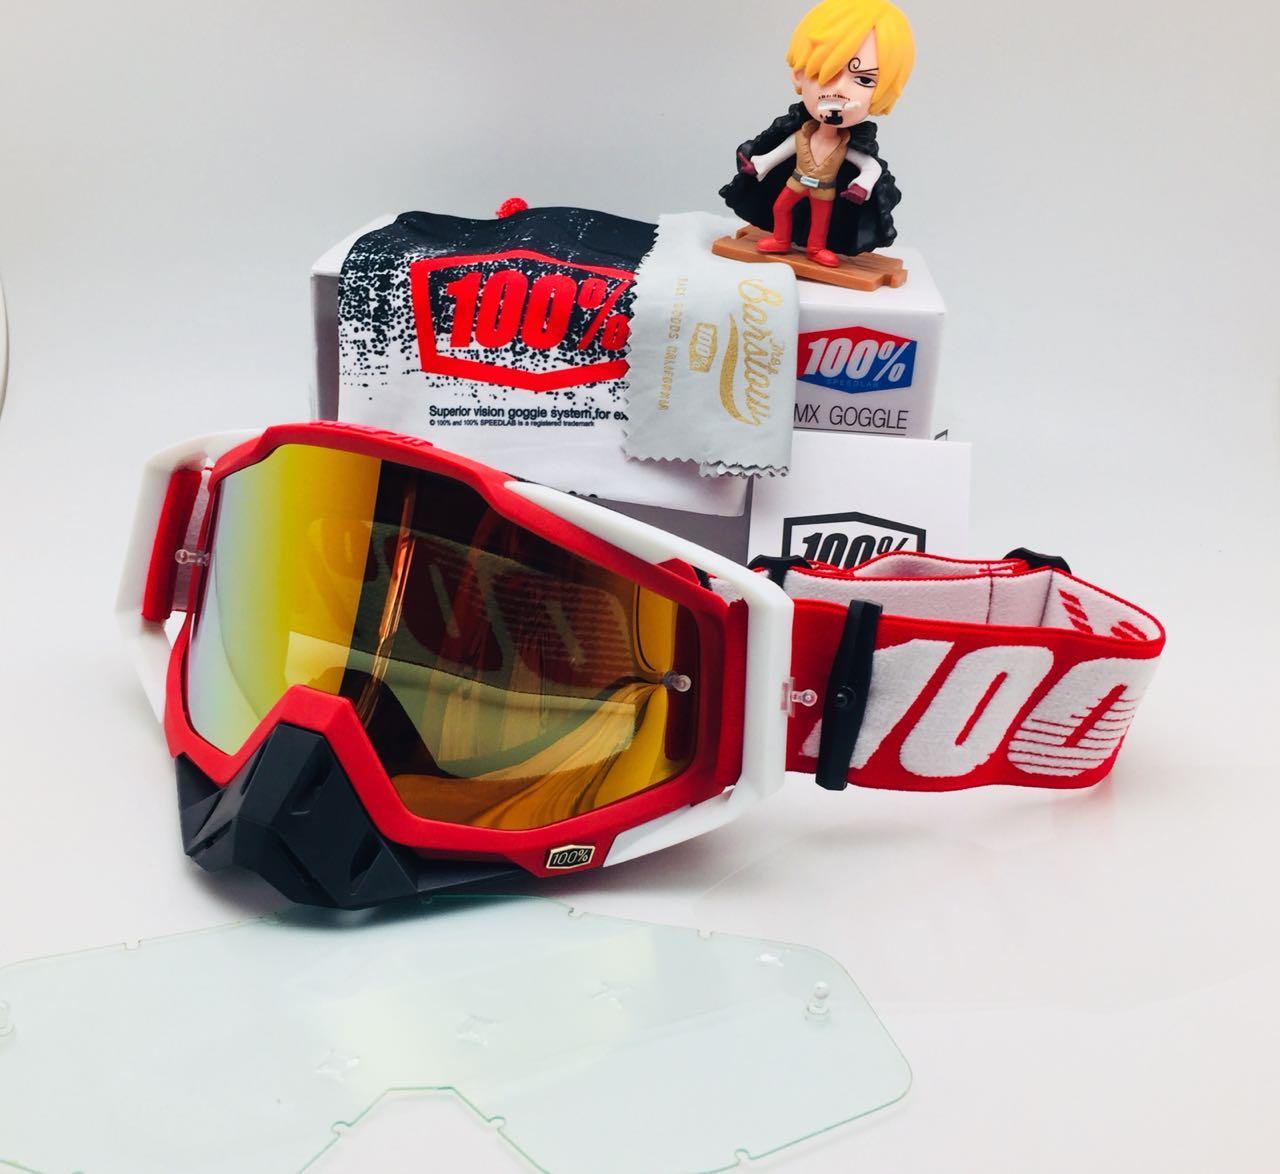 Beli Kacamata Goggles Sepeda Motor Tactical Outdoor Helm Google Osbe Goggle Cross New Energic Collour Safety Your Lensa Anti Uvi